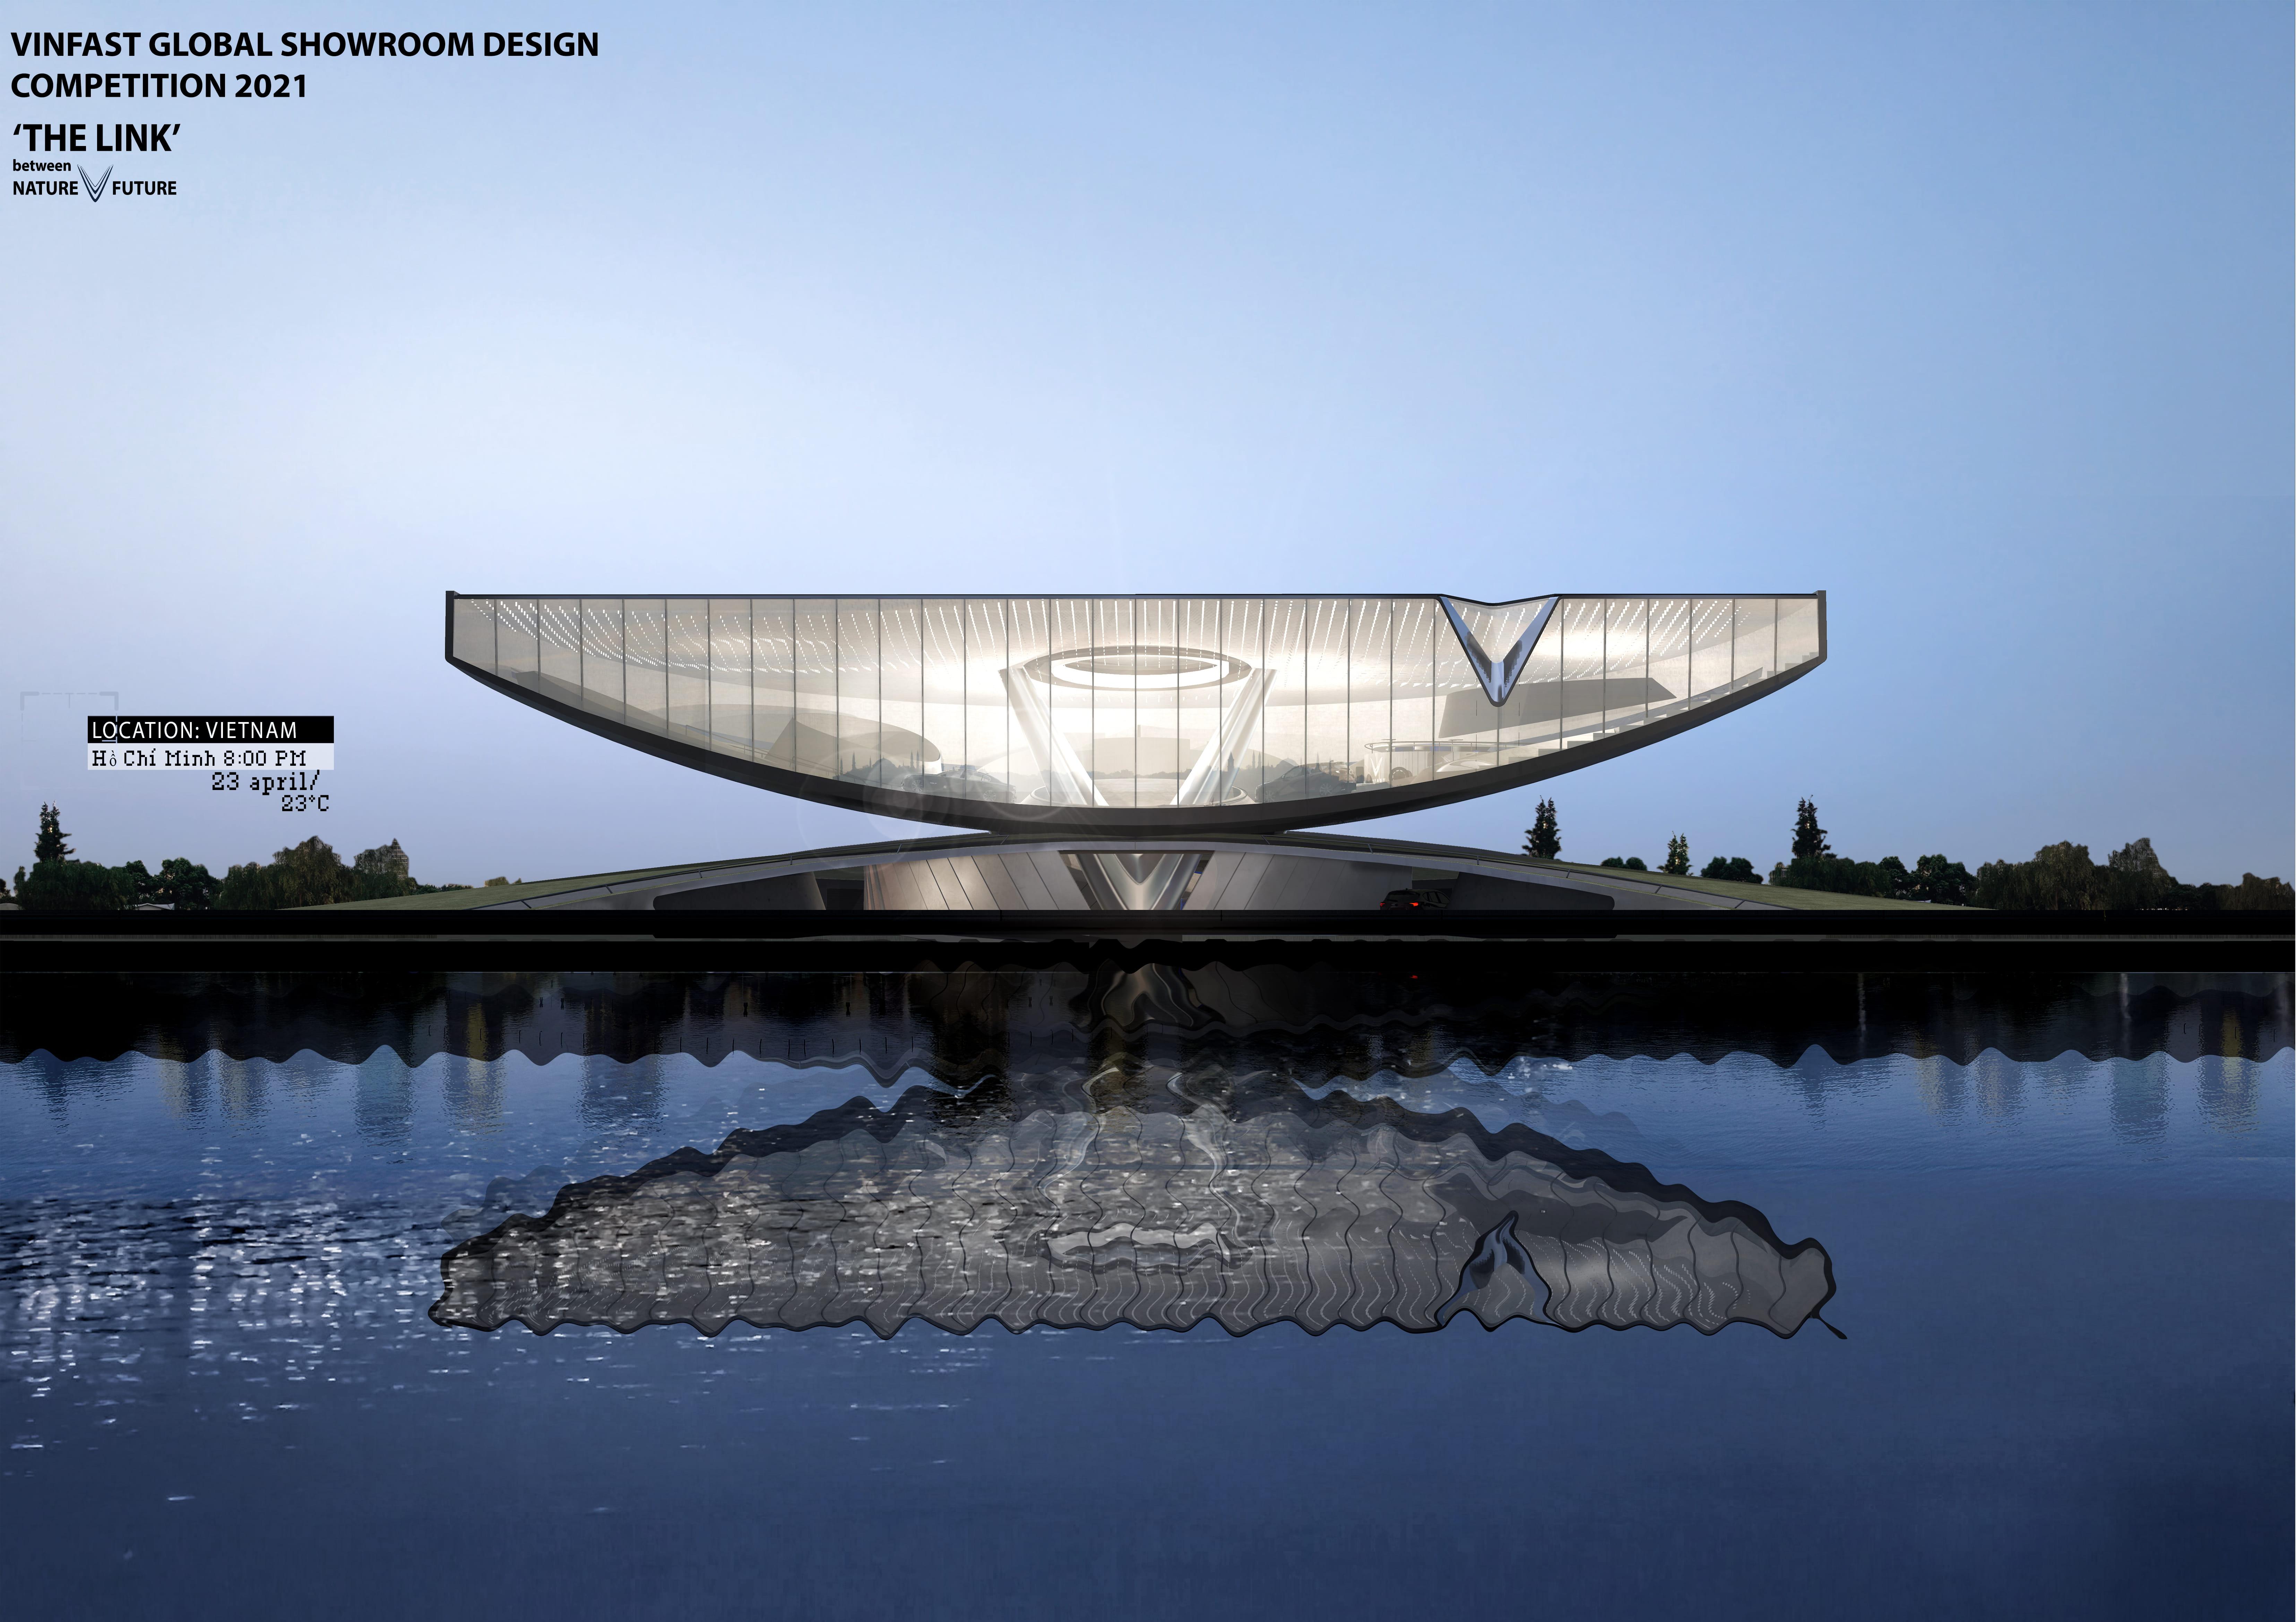 9 thiết kế showroom VinFast toàn cầu xuất sắc nhất arkinom-3.jpg